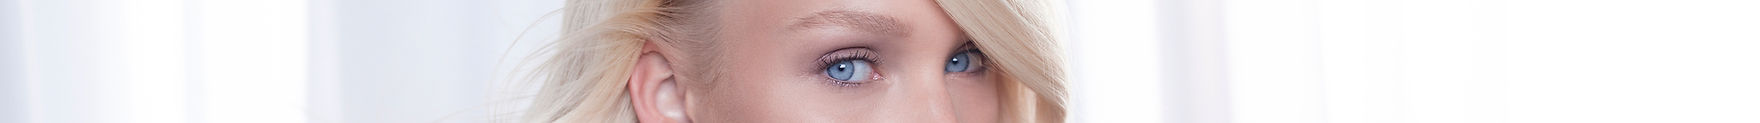 Model Augenbrauen